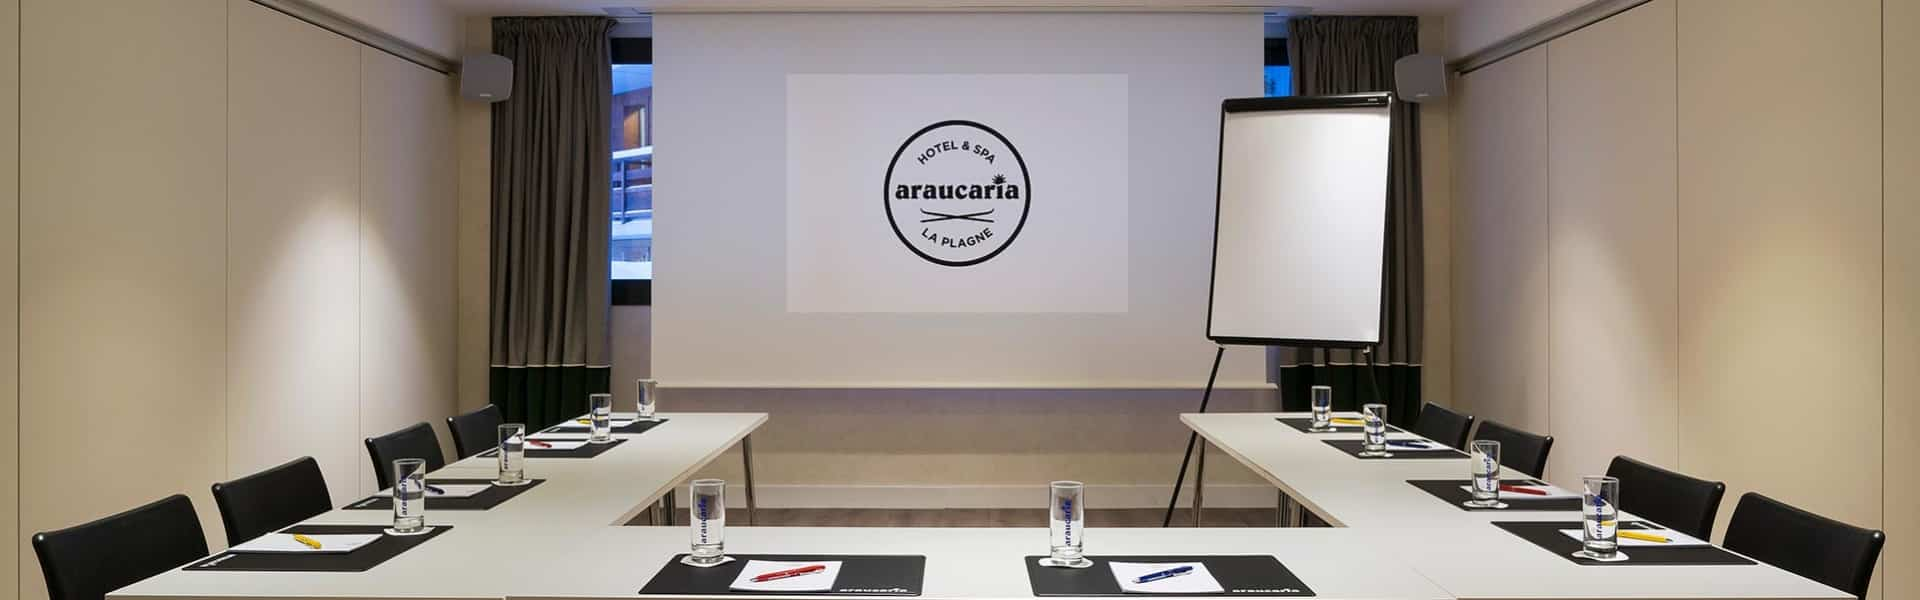 Araucaria Hotel & Spa La Plagne - salle de séminaire